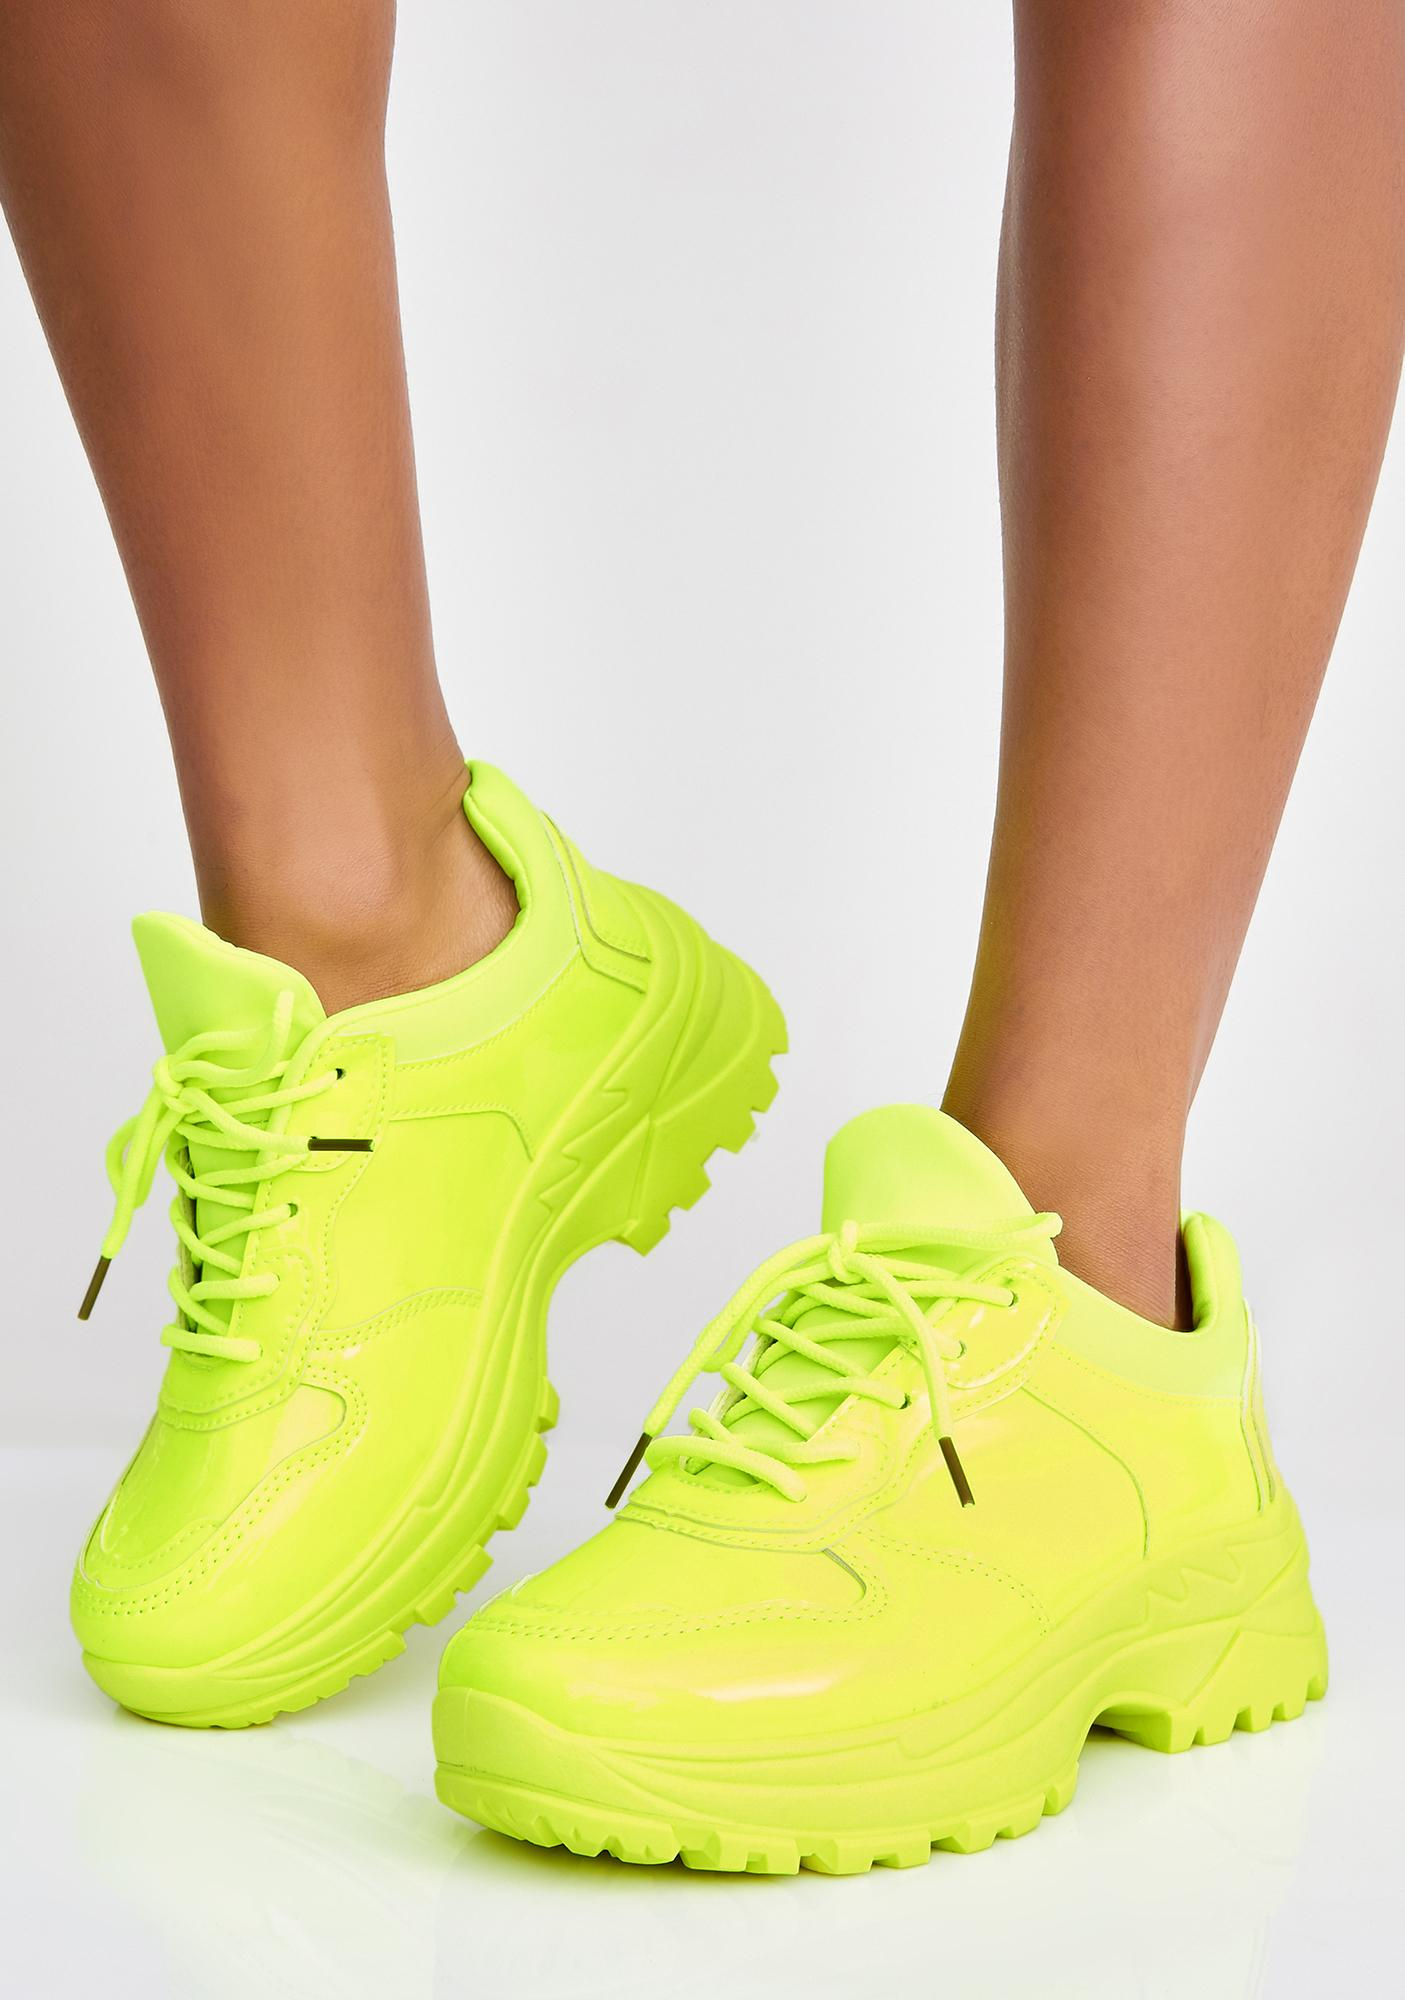 Neon Platform Sneakers Yellow   Dolls Kill